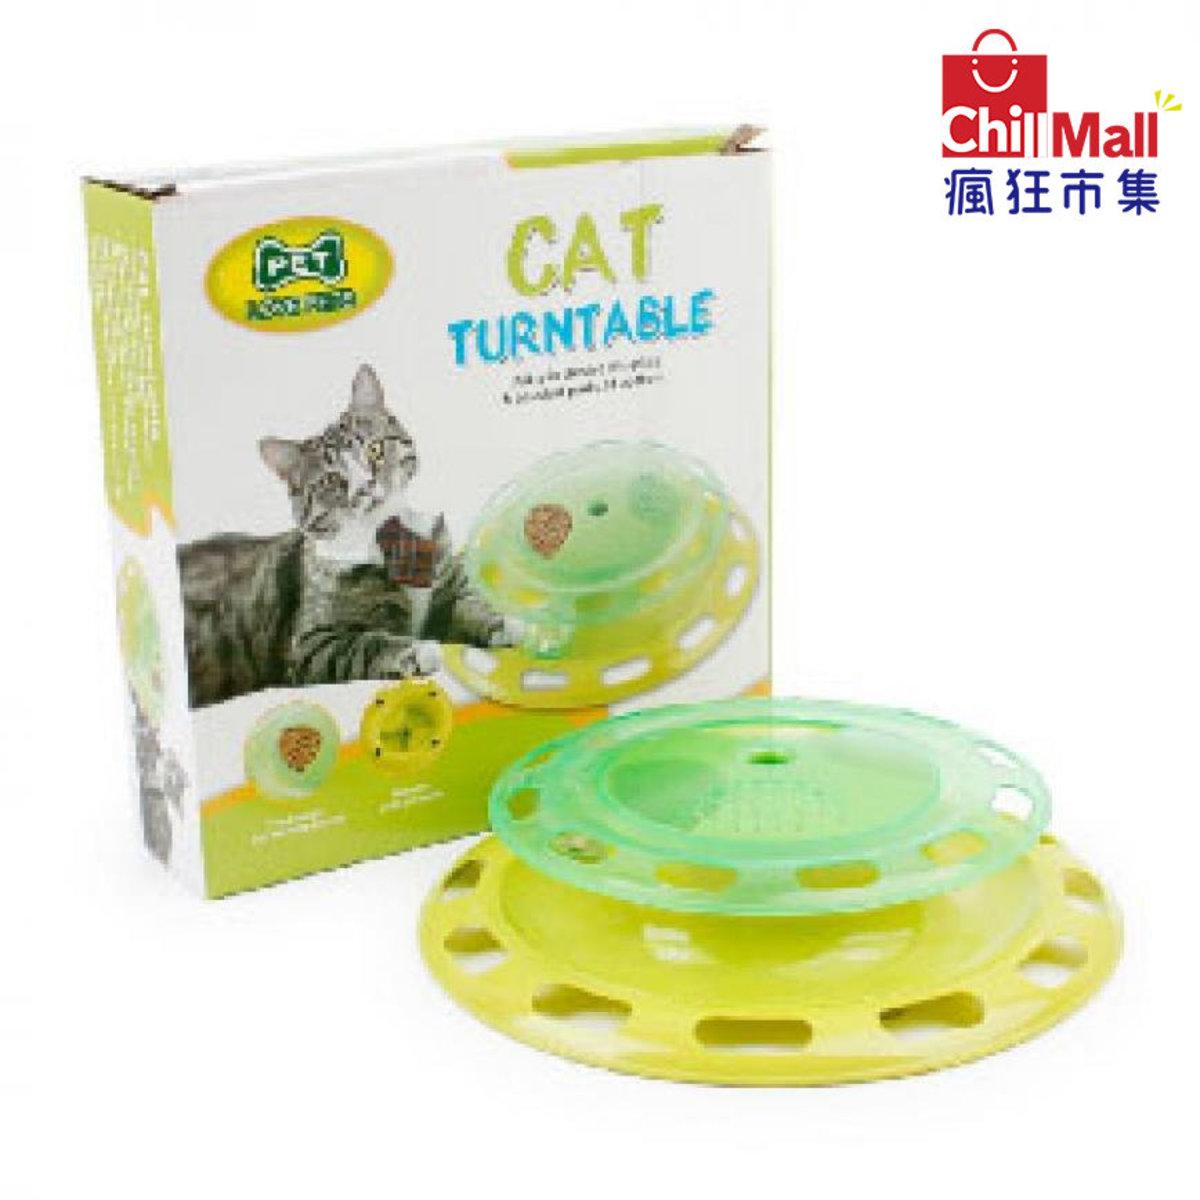 Cat Turntable 多元合一趣味 帶鈴鐺球旋轉美食遊樂盤